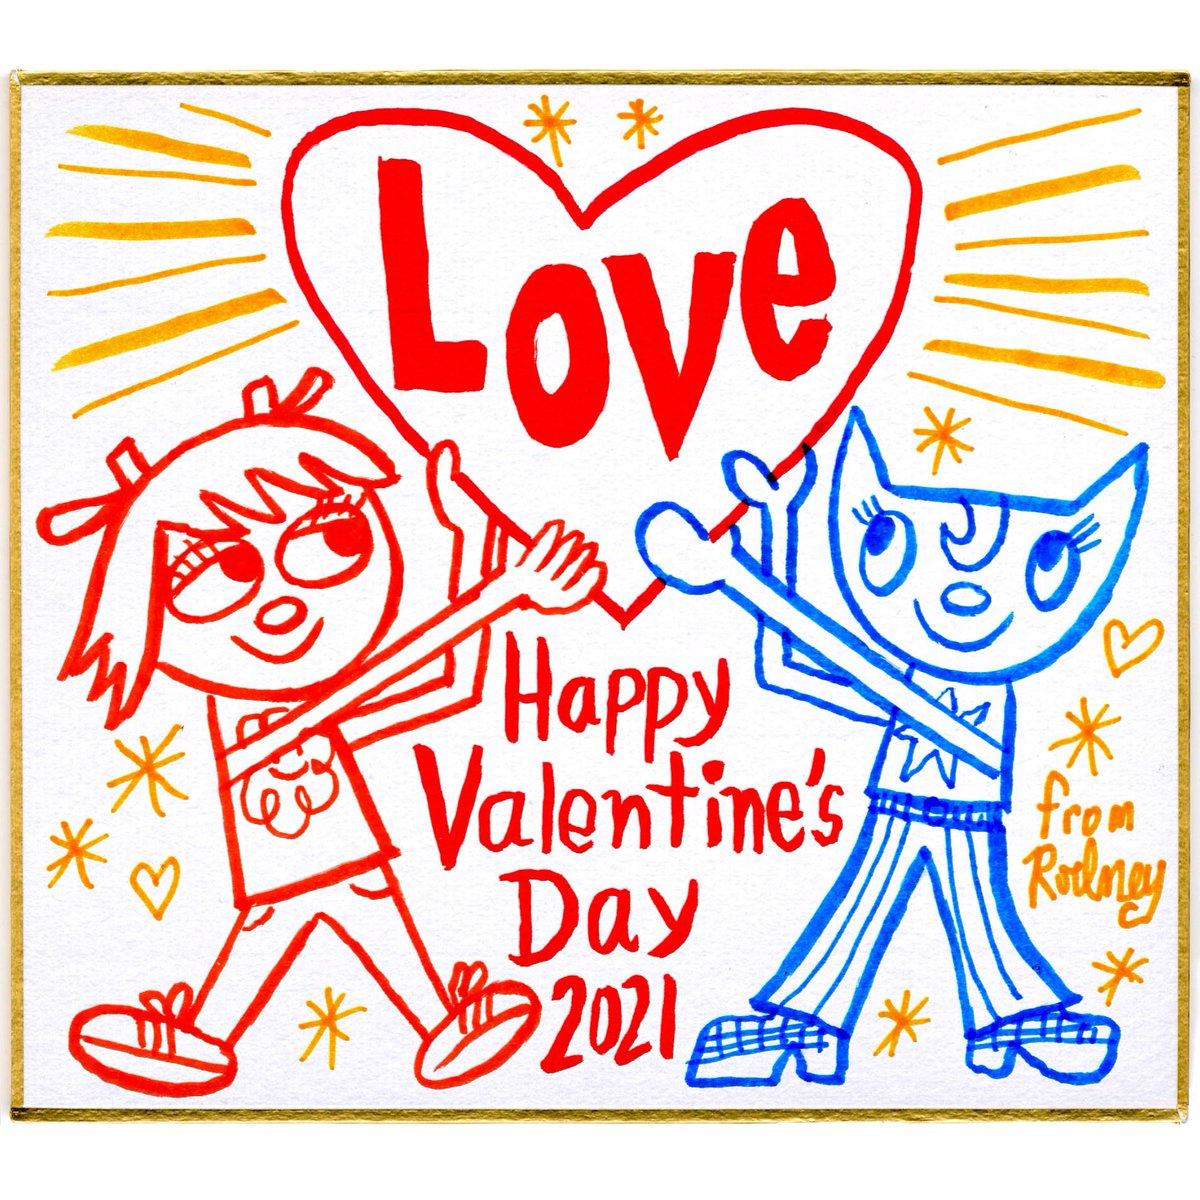 Happy Valentine's Day❣️ #ロドニーアラングリーンブラット #バレンタイン